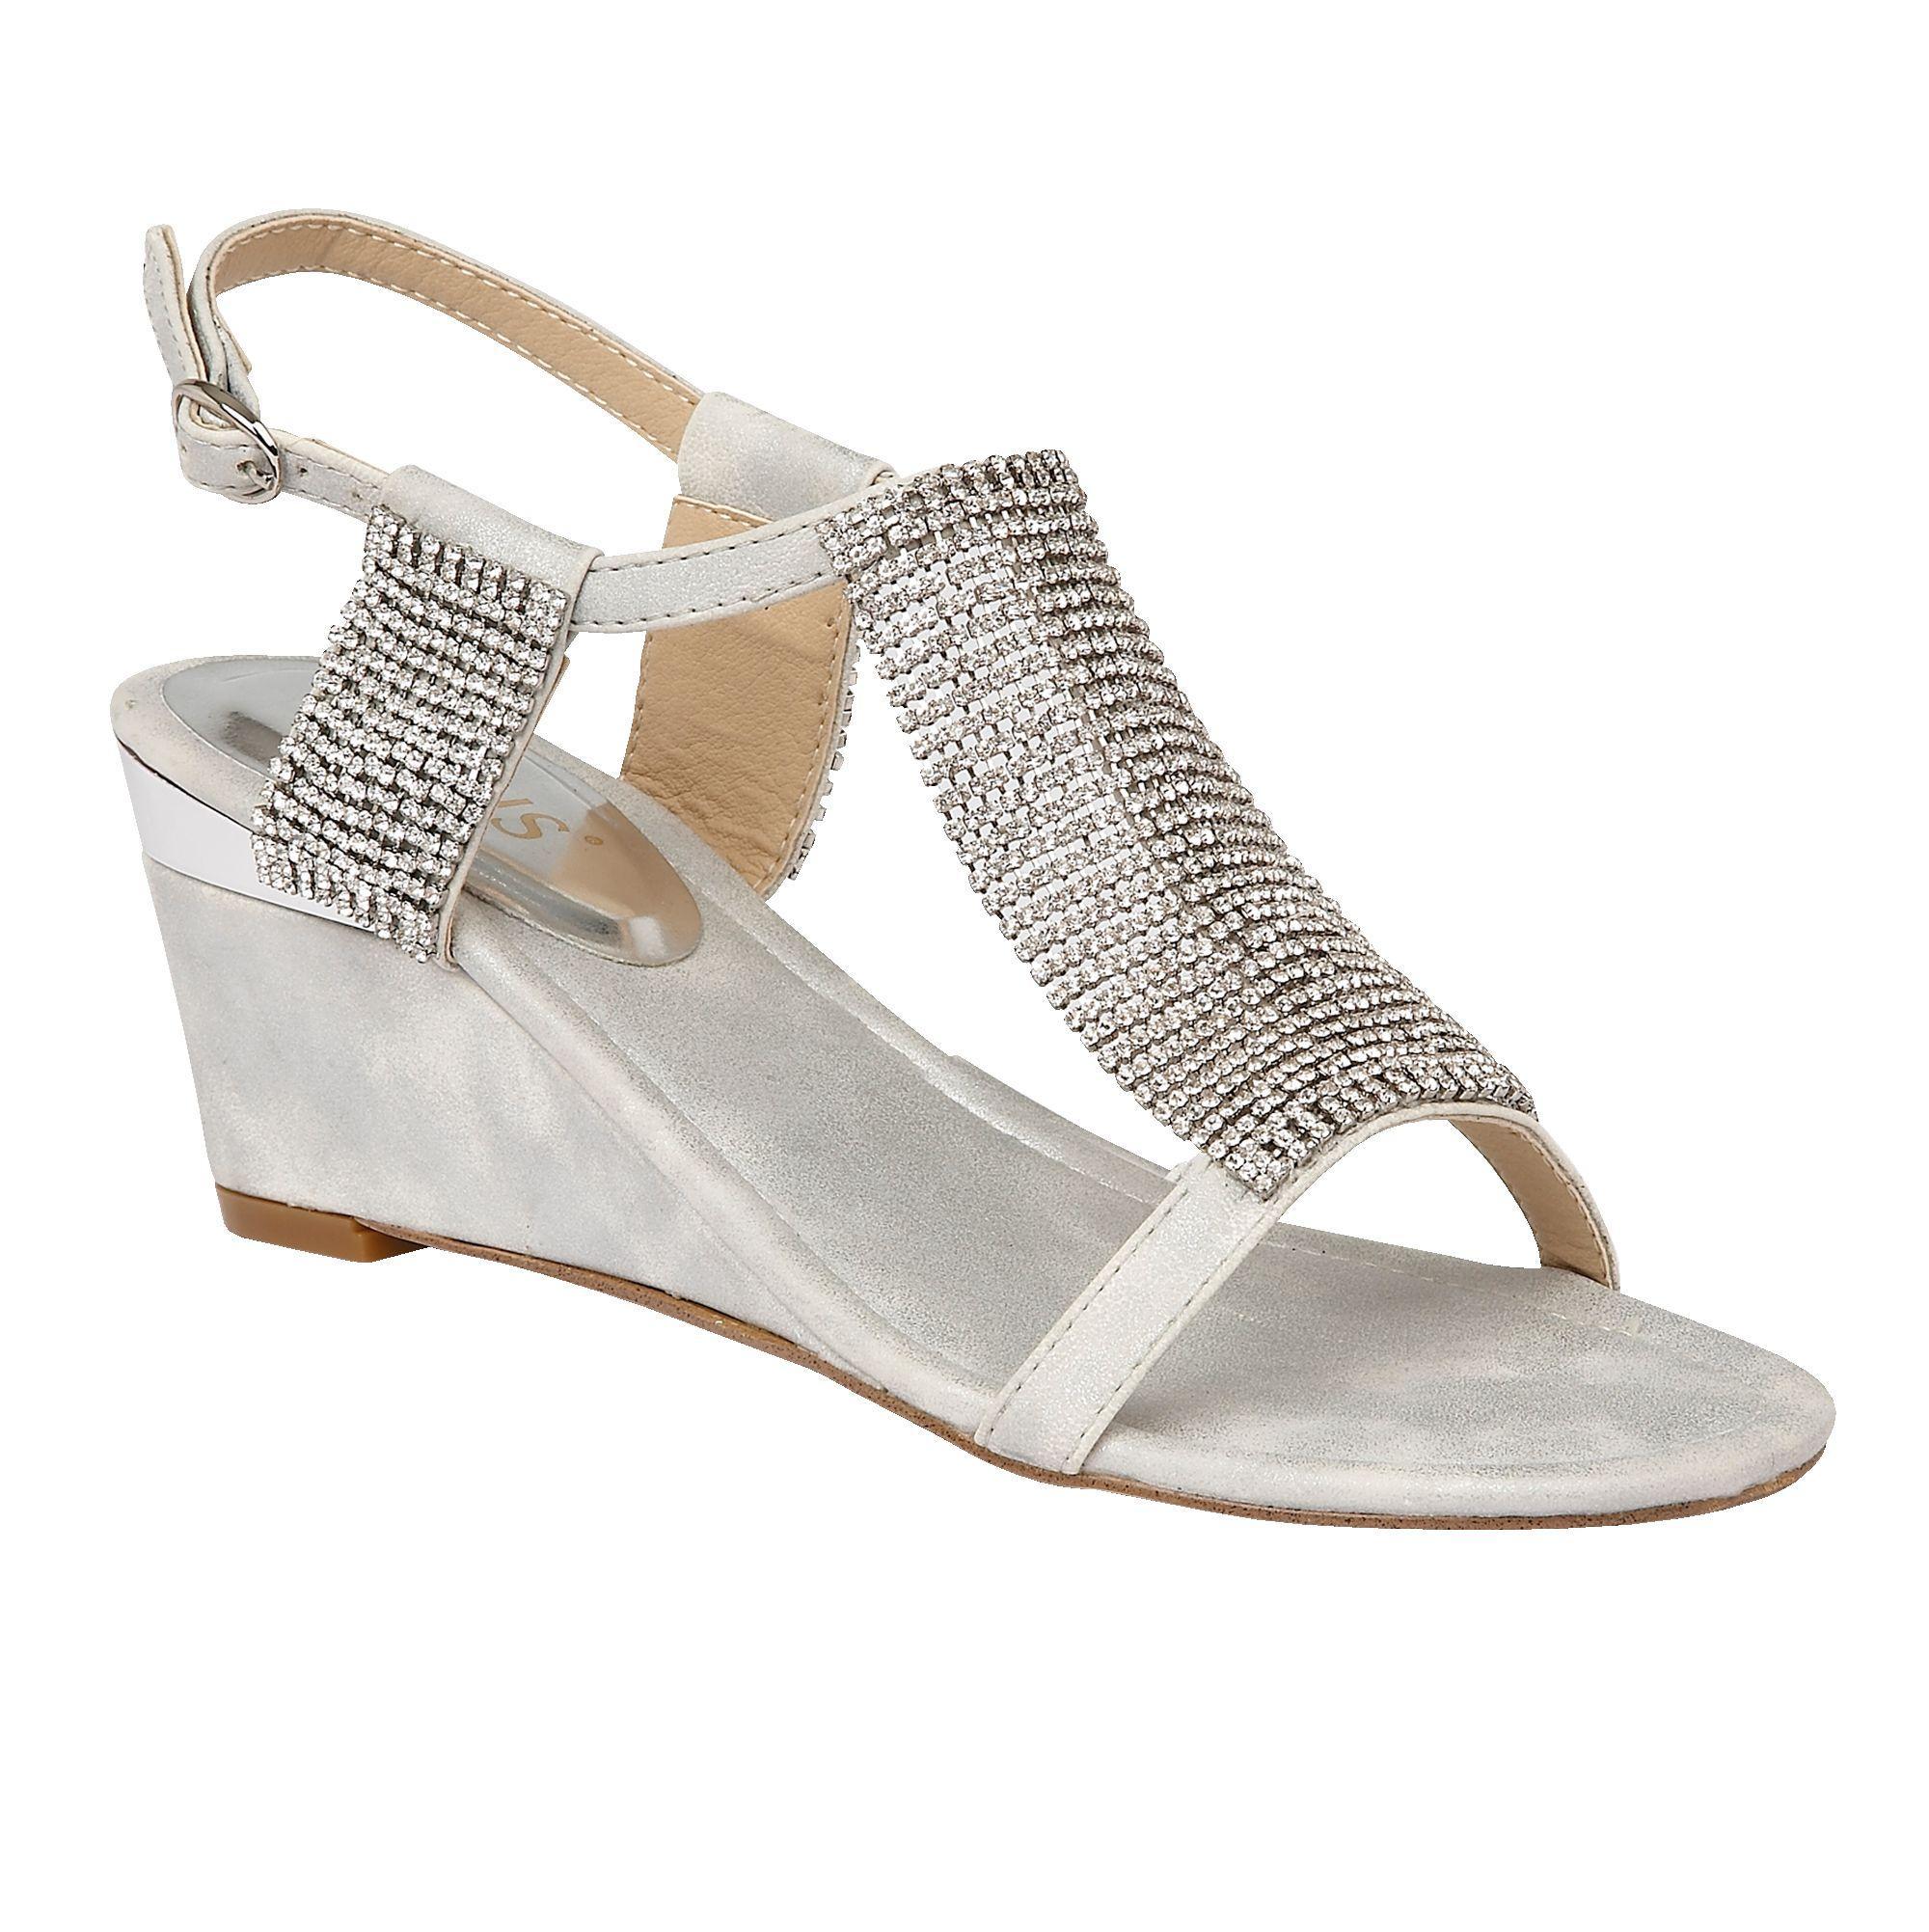 Lotus Klaudia Wedge Sandals In Metallic Lyst